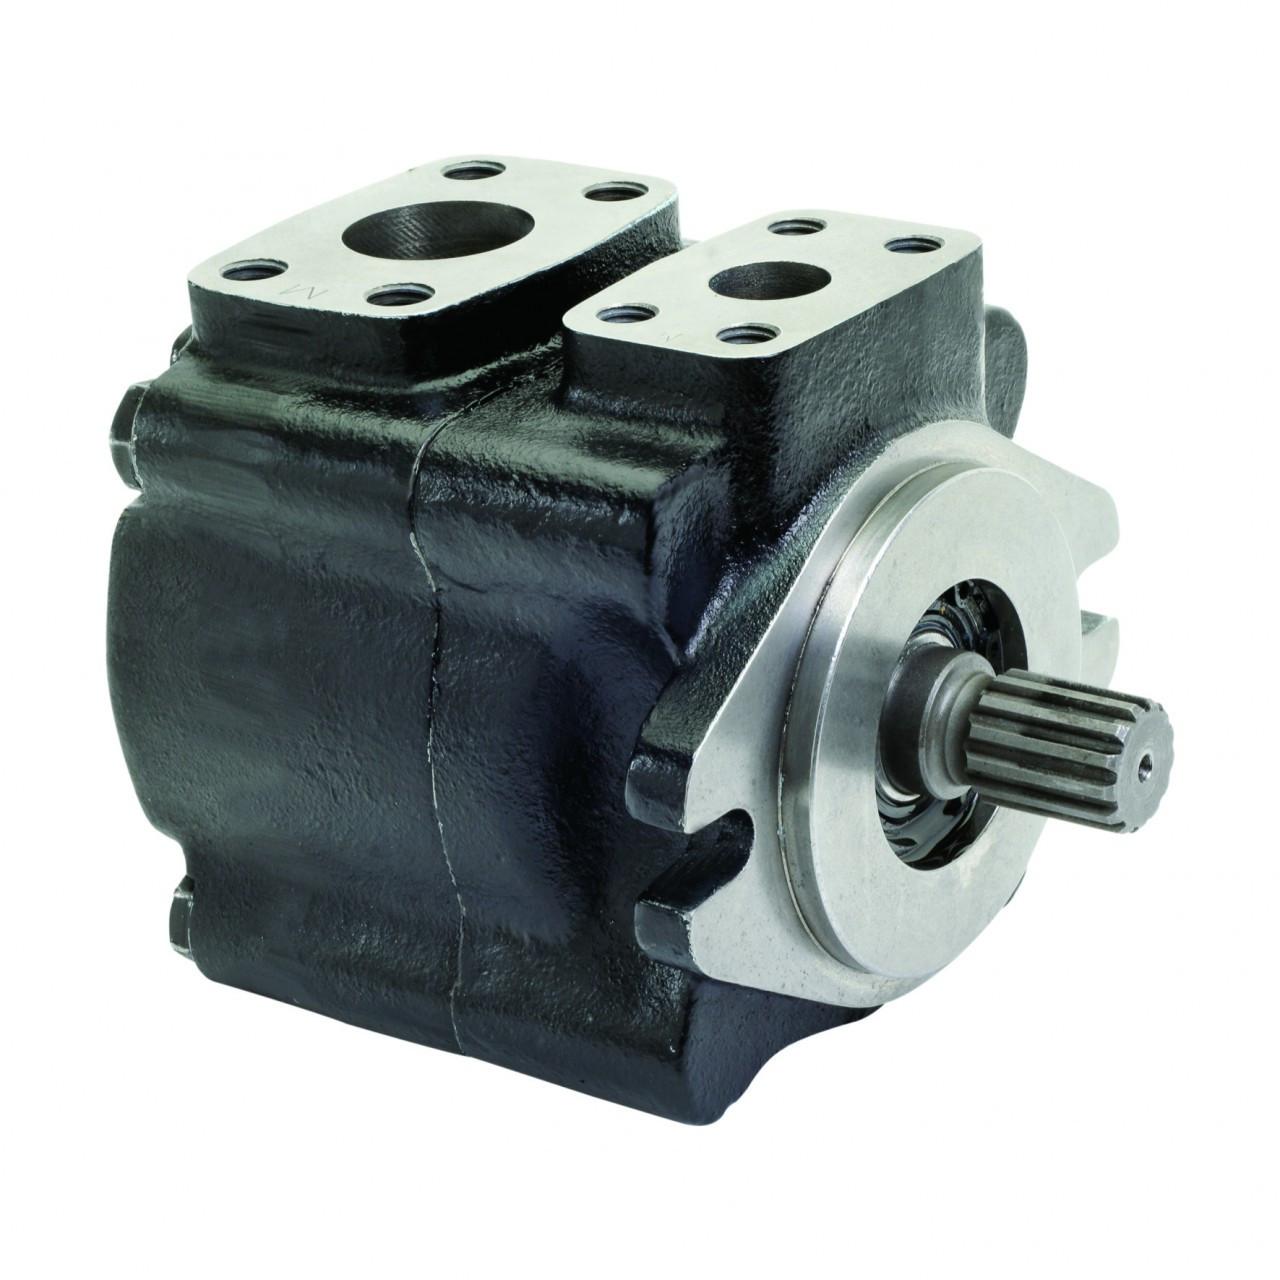 Veljan Single Vane Pump - VTXB1/VTXB2 - Rons Drivelines | Drivelines | Driveshafts